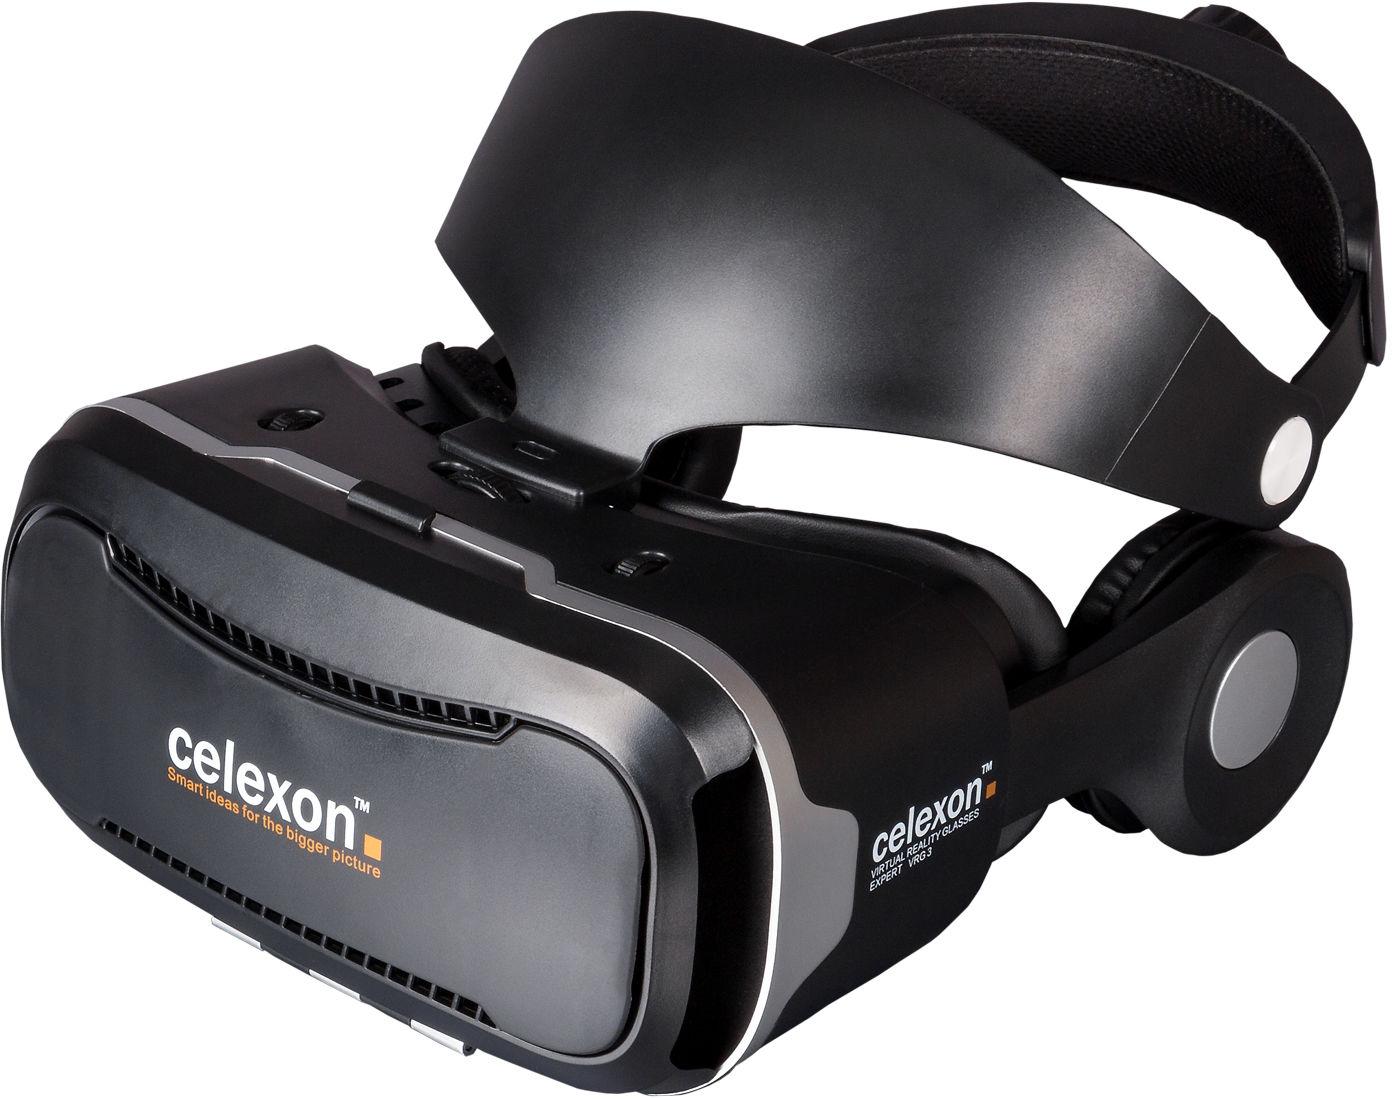 celexon VRG 3 Expert Plus okulary 3D Virtual Reality